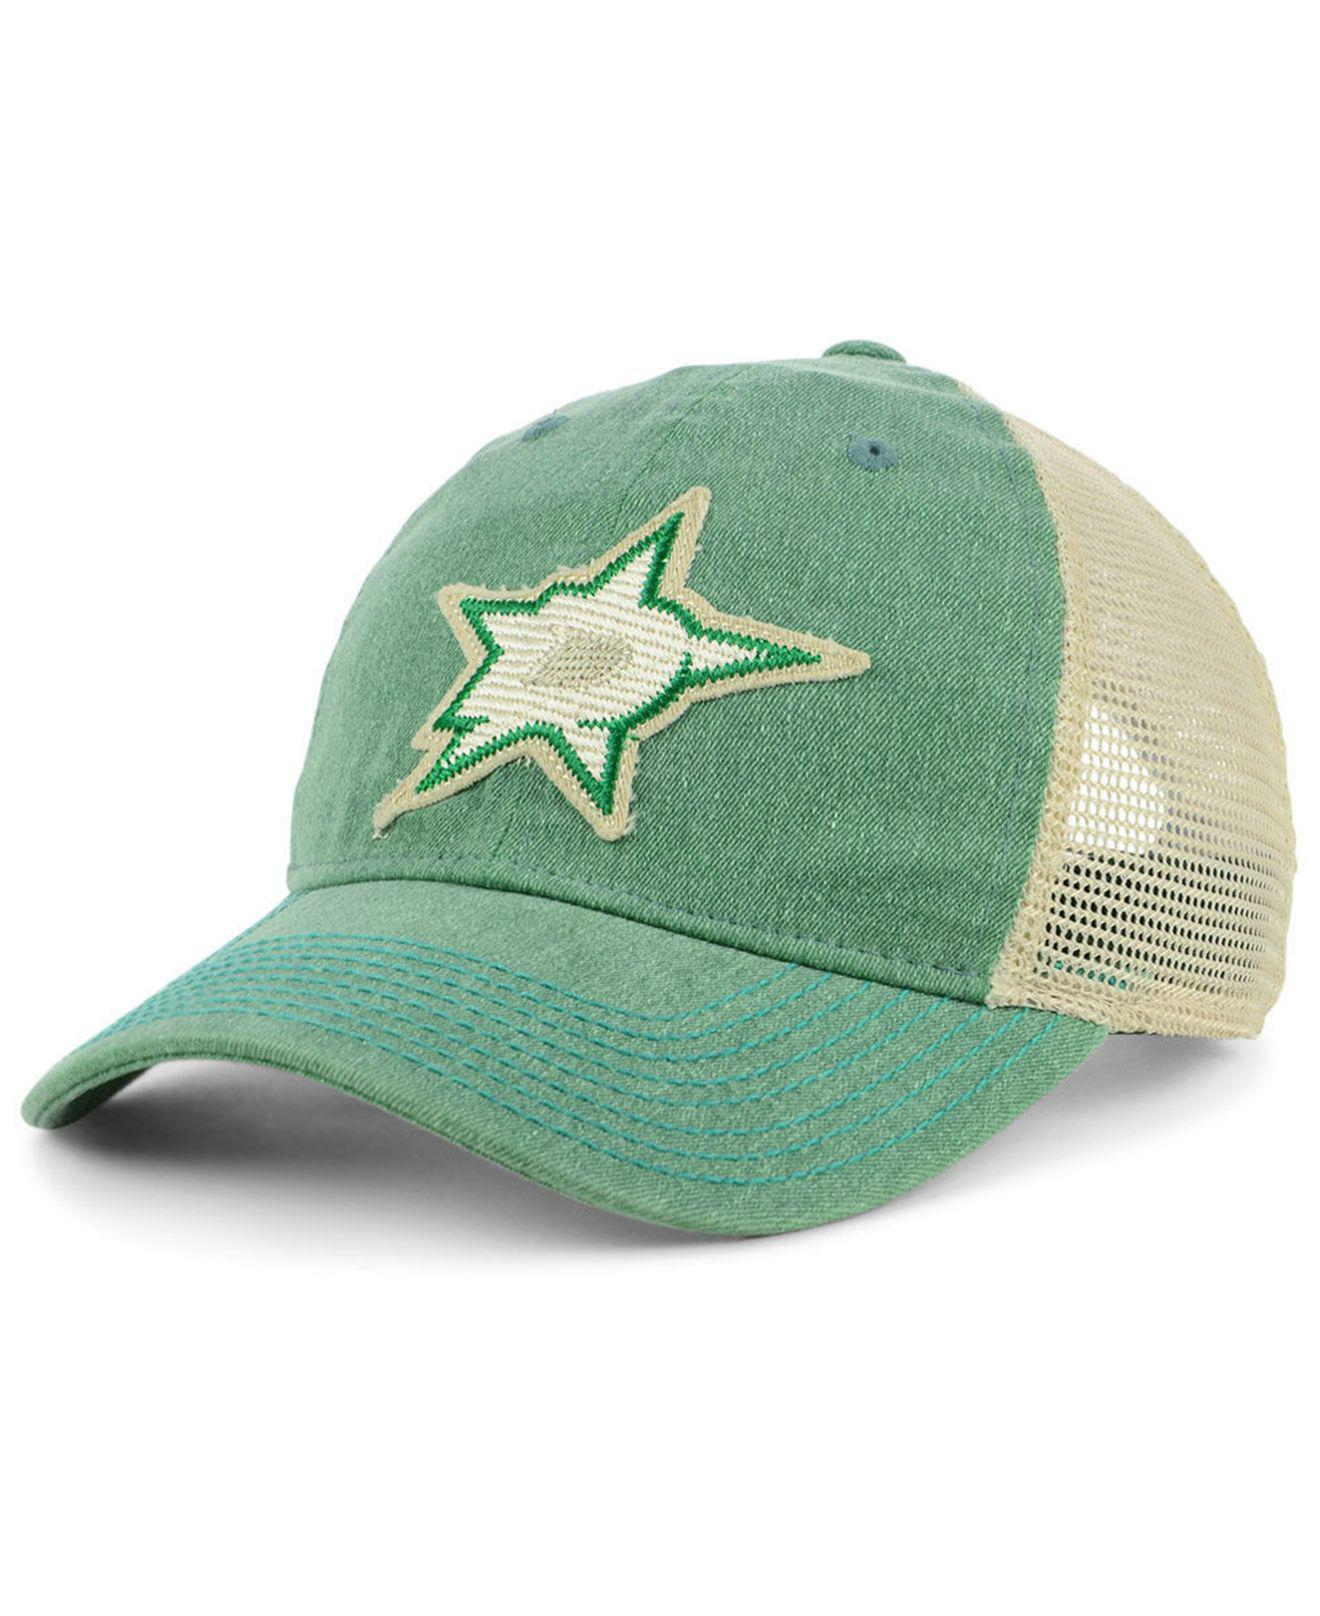 super popular 84fde 7d668 ... reduced adidas. mens green dallas stars sun bleached slouch cap 62be1  660b6